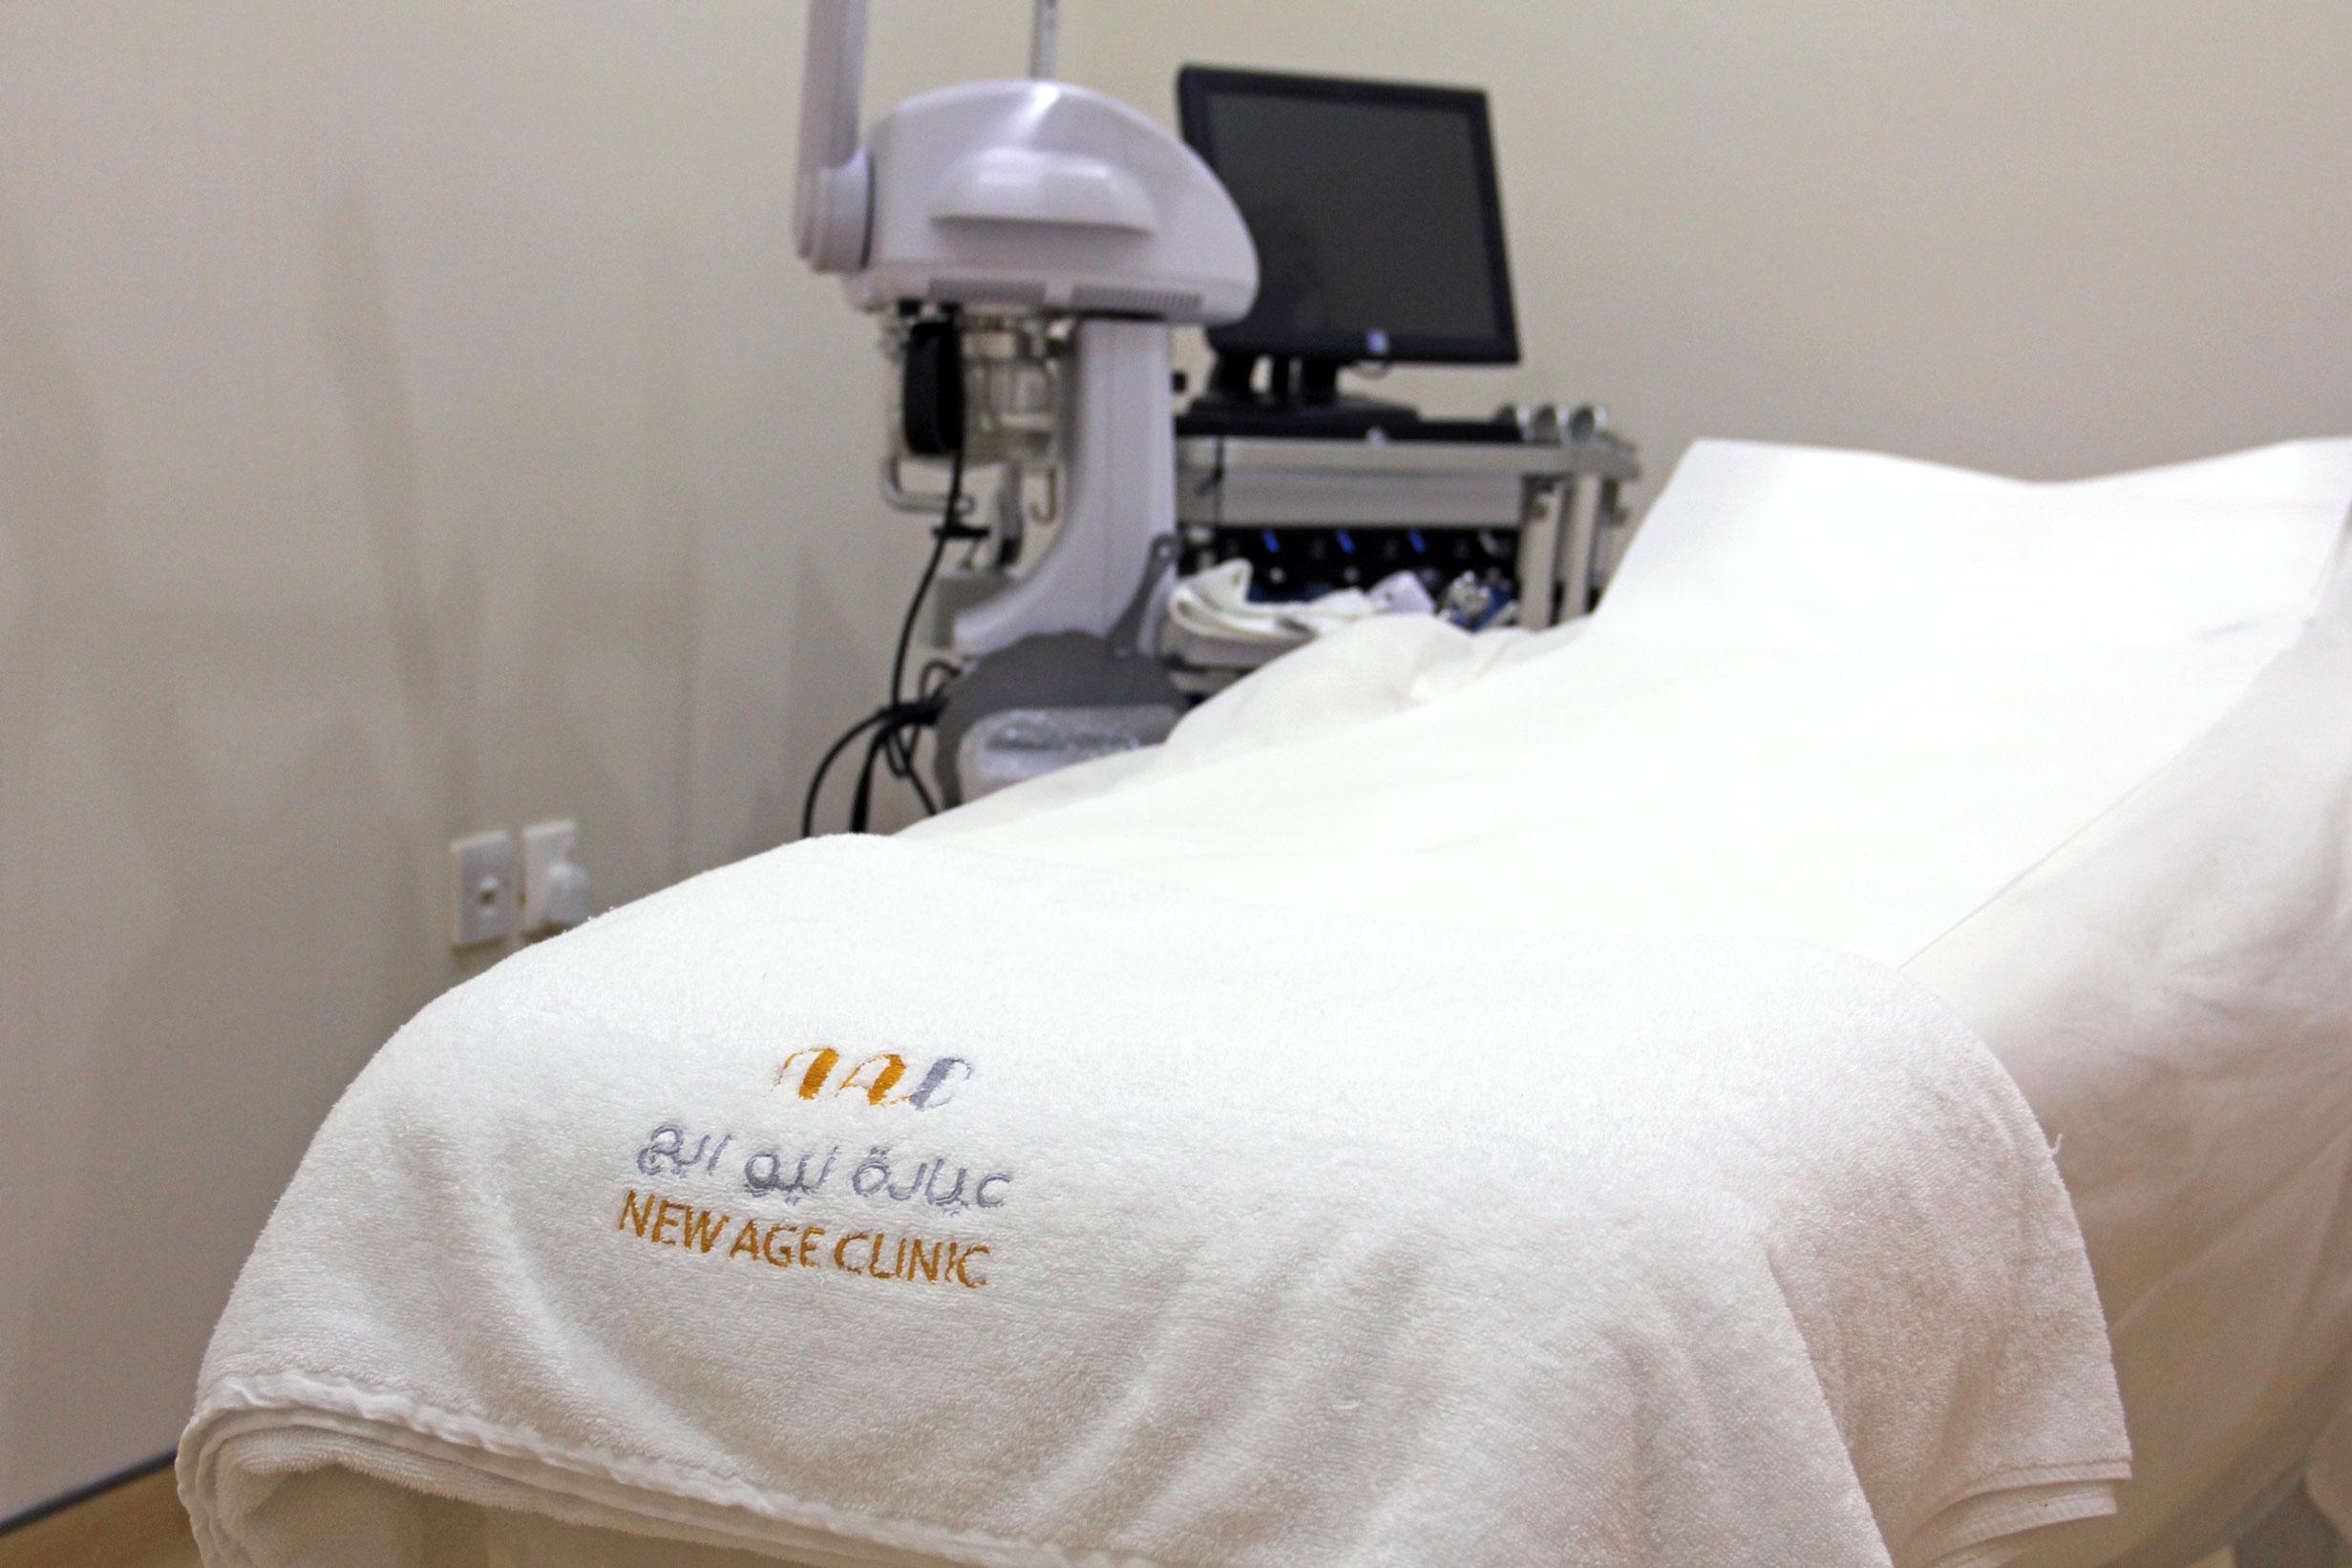 New Age Clinic Hydrafacial